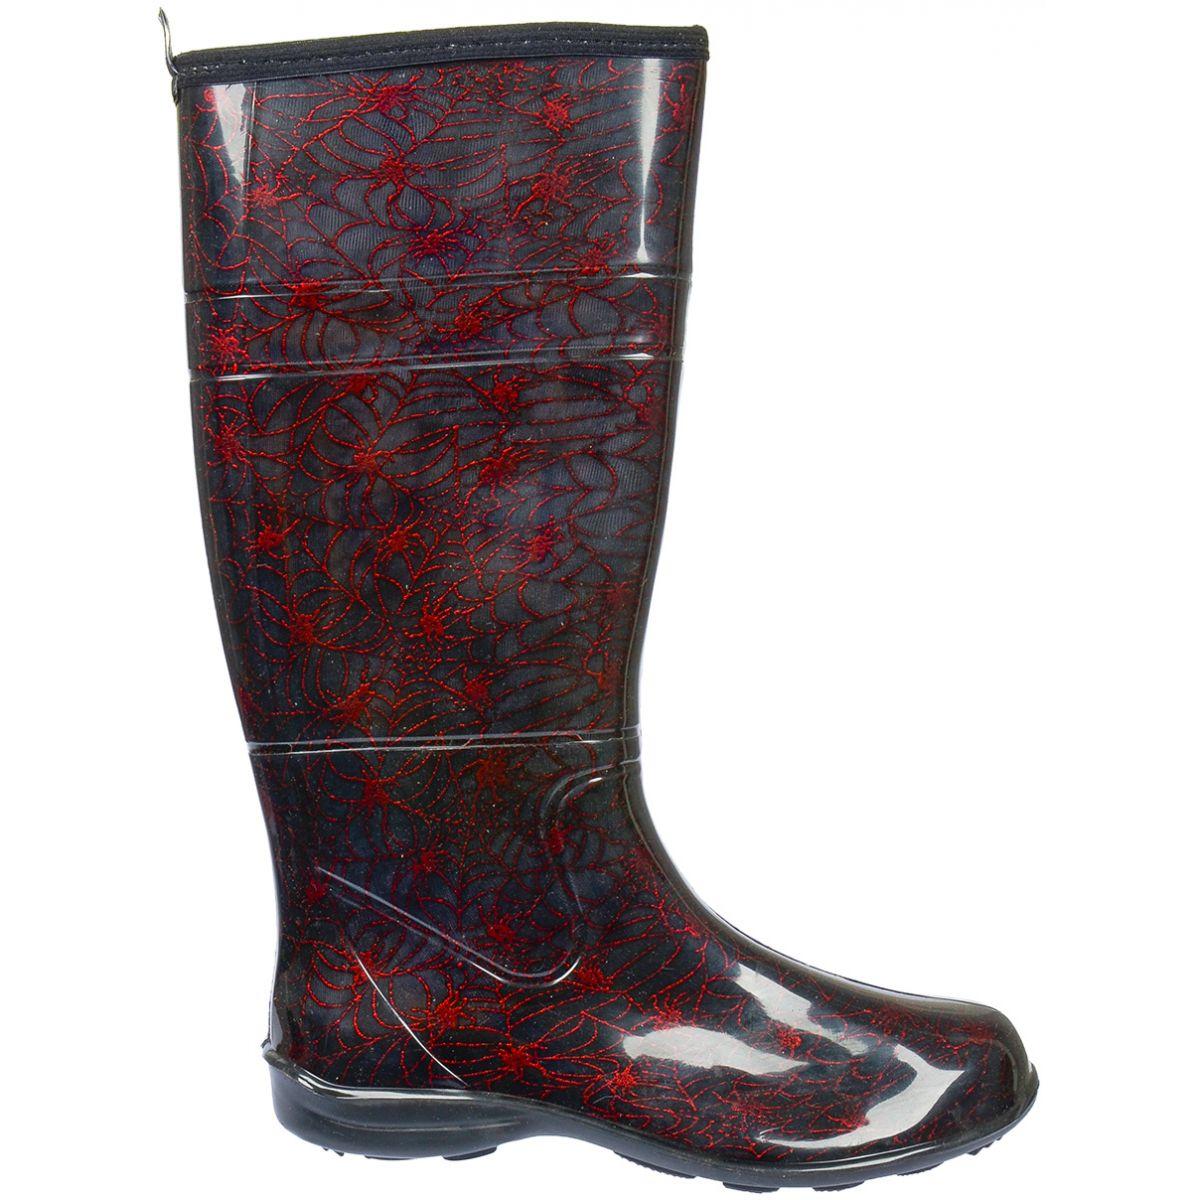 Galocha Alpat Fashion Preto Aranha Vermelho